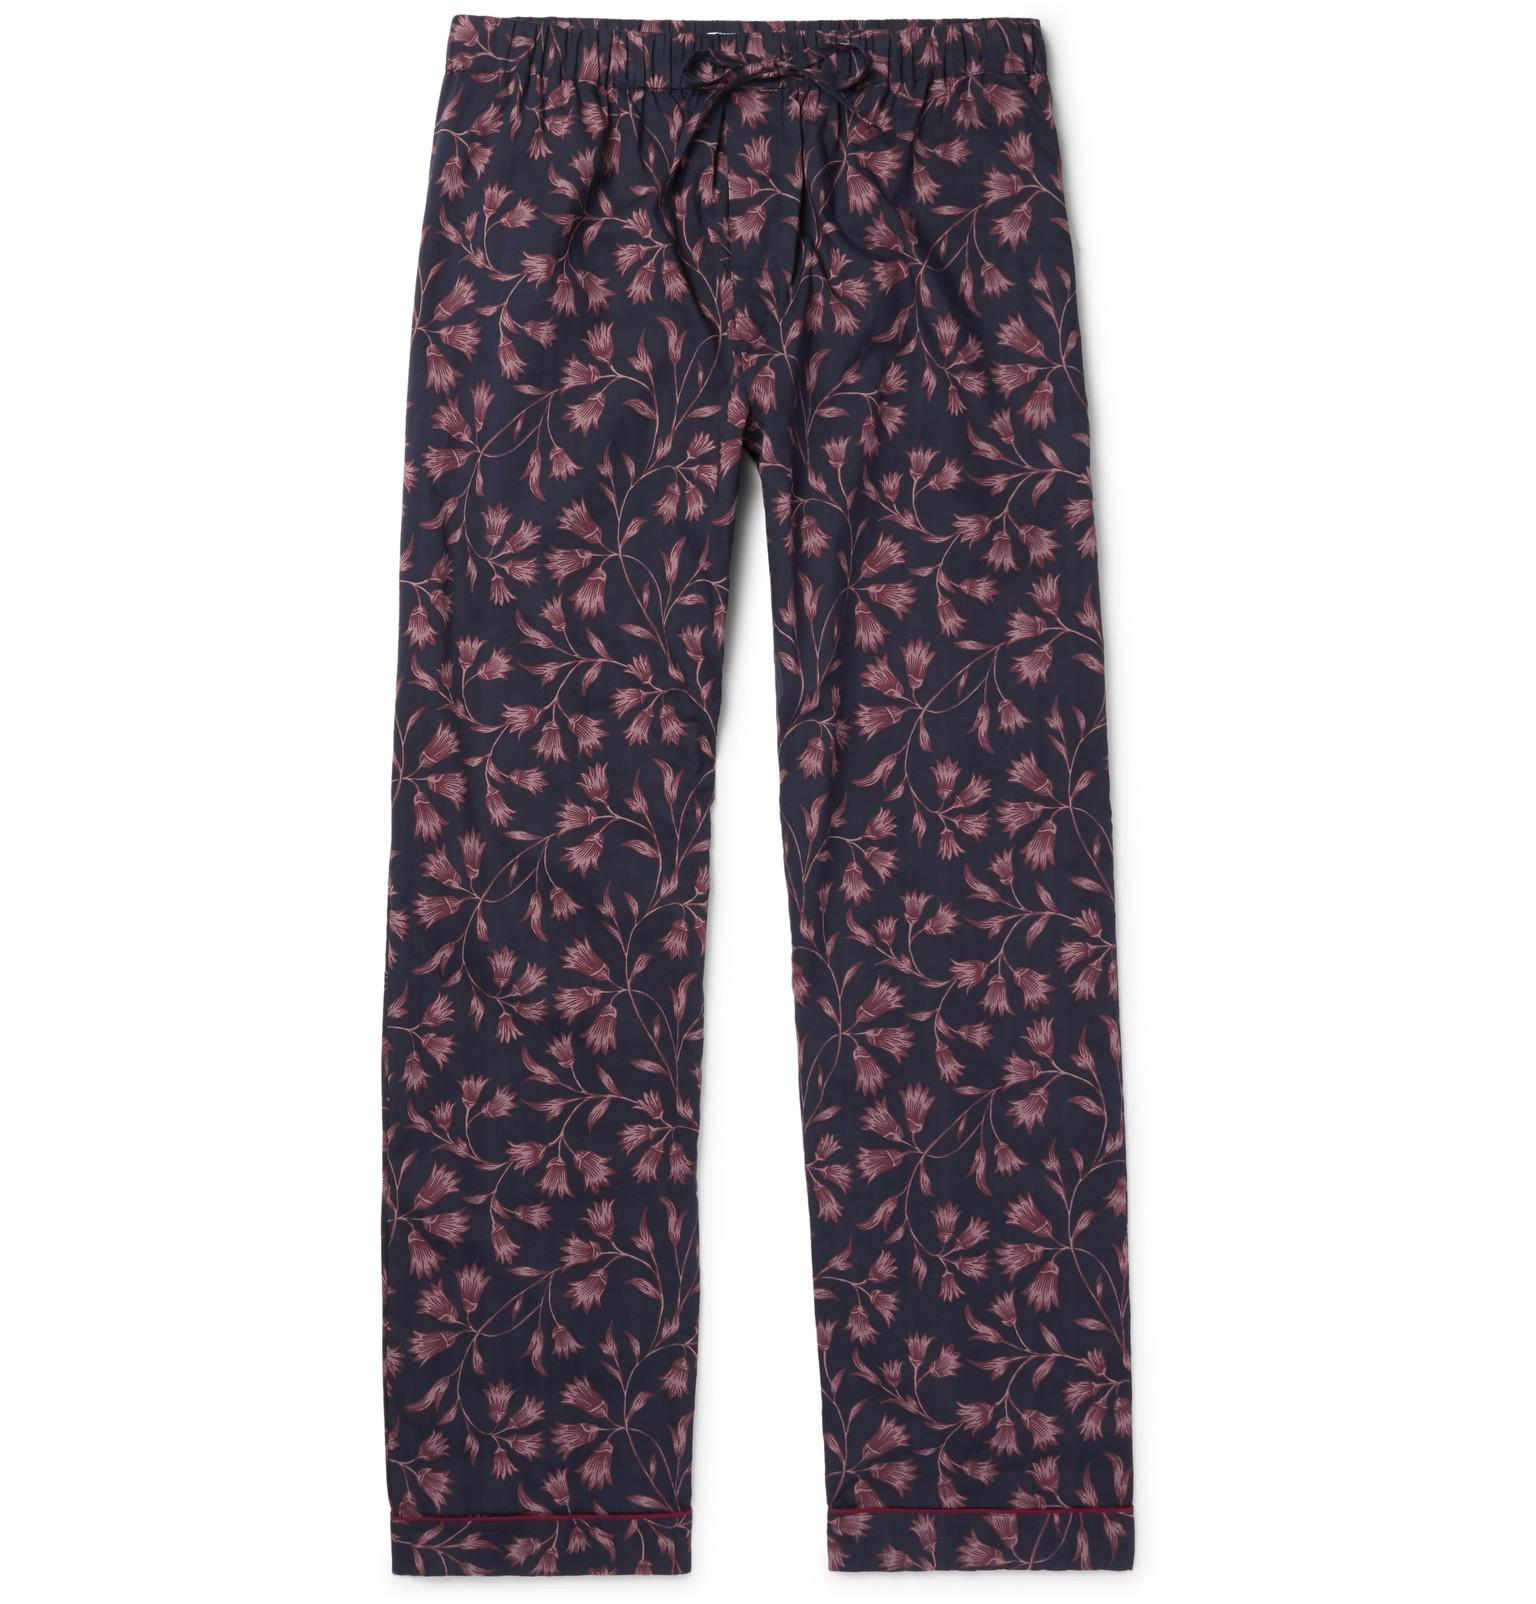 Desmond & Dempsey Printed Cotton Pyjama Trousers - Blue 4n6RFfL1